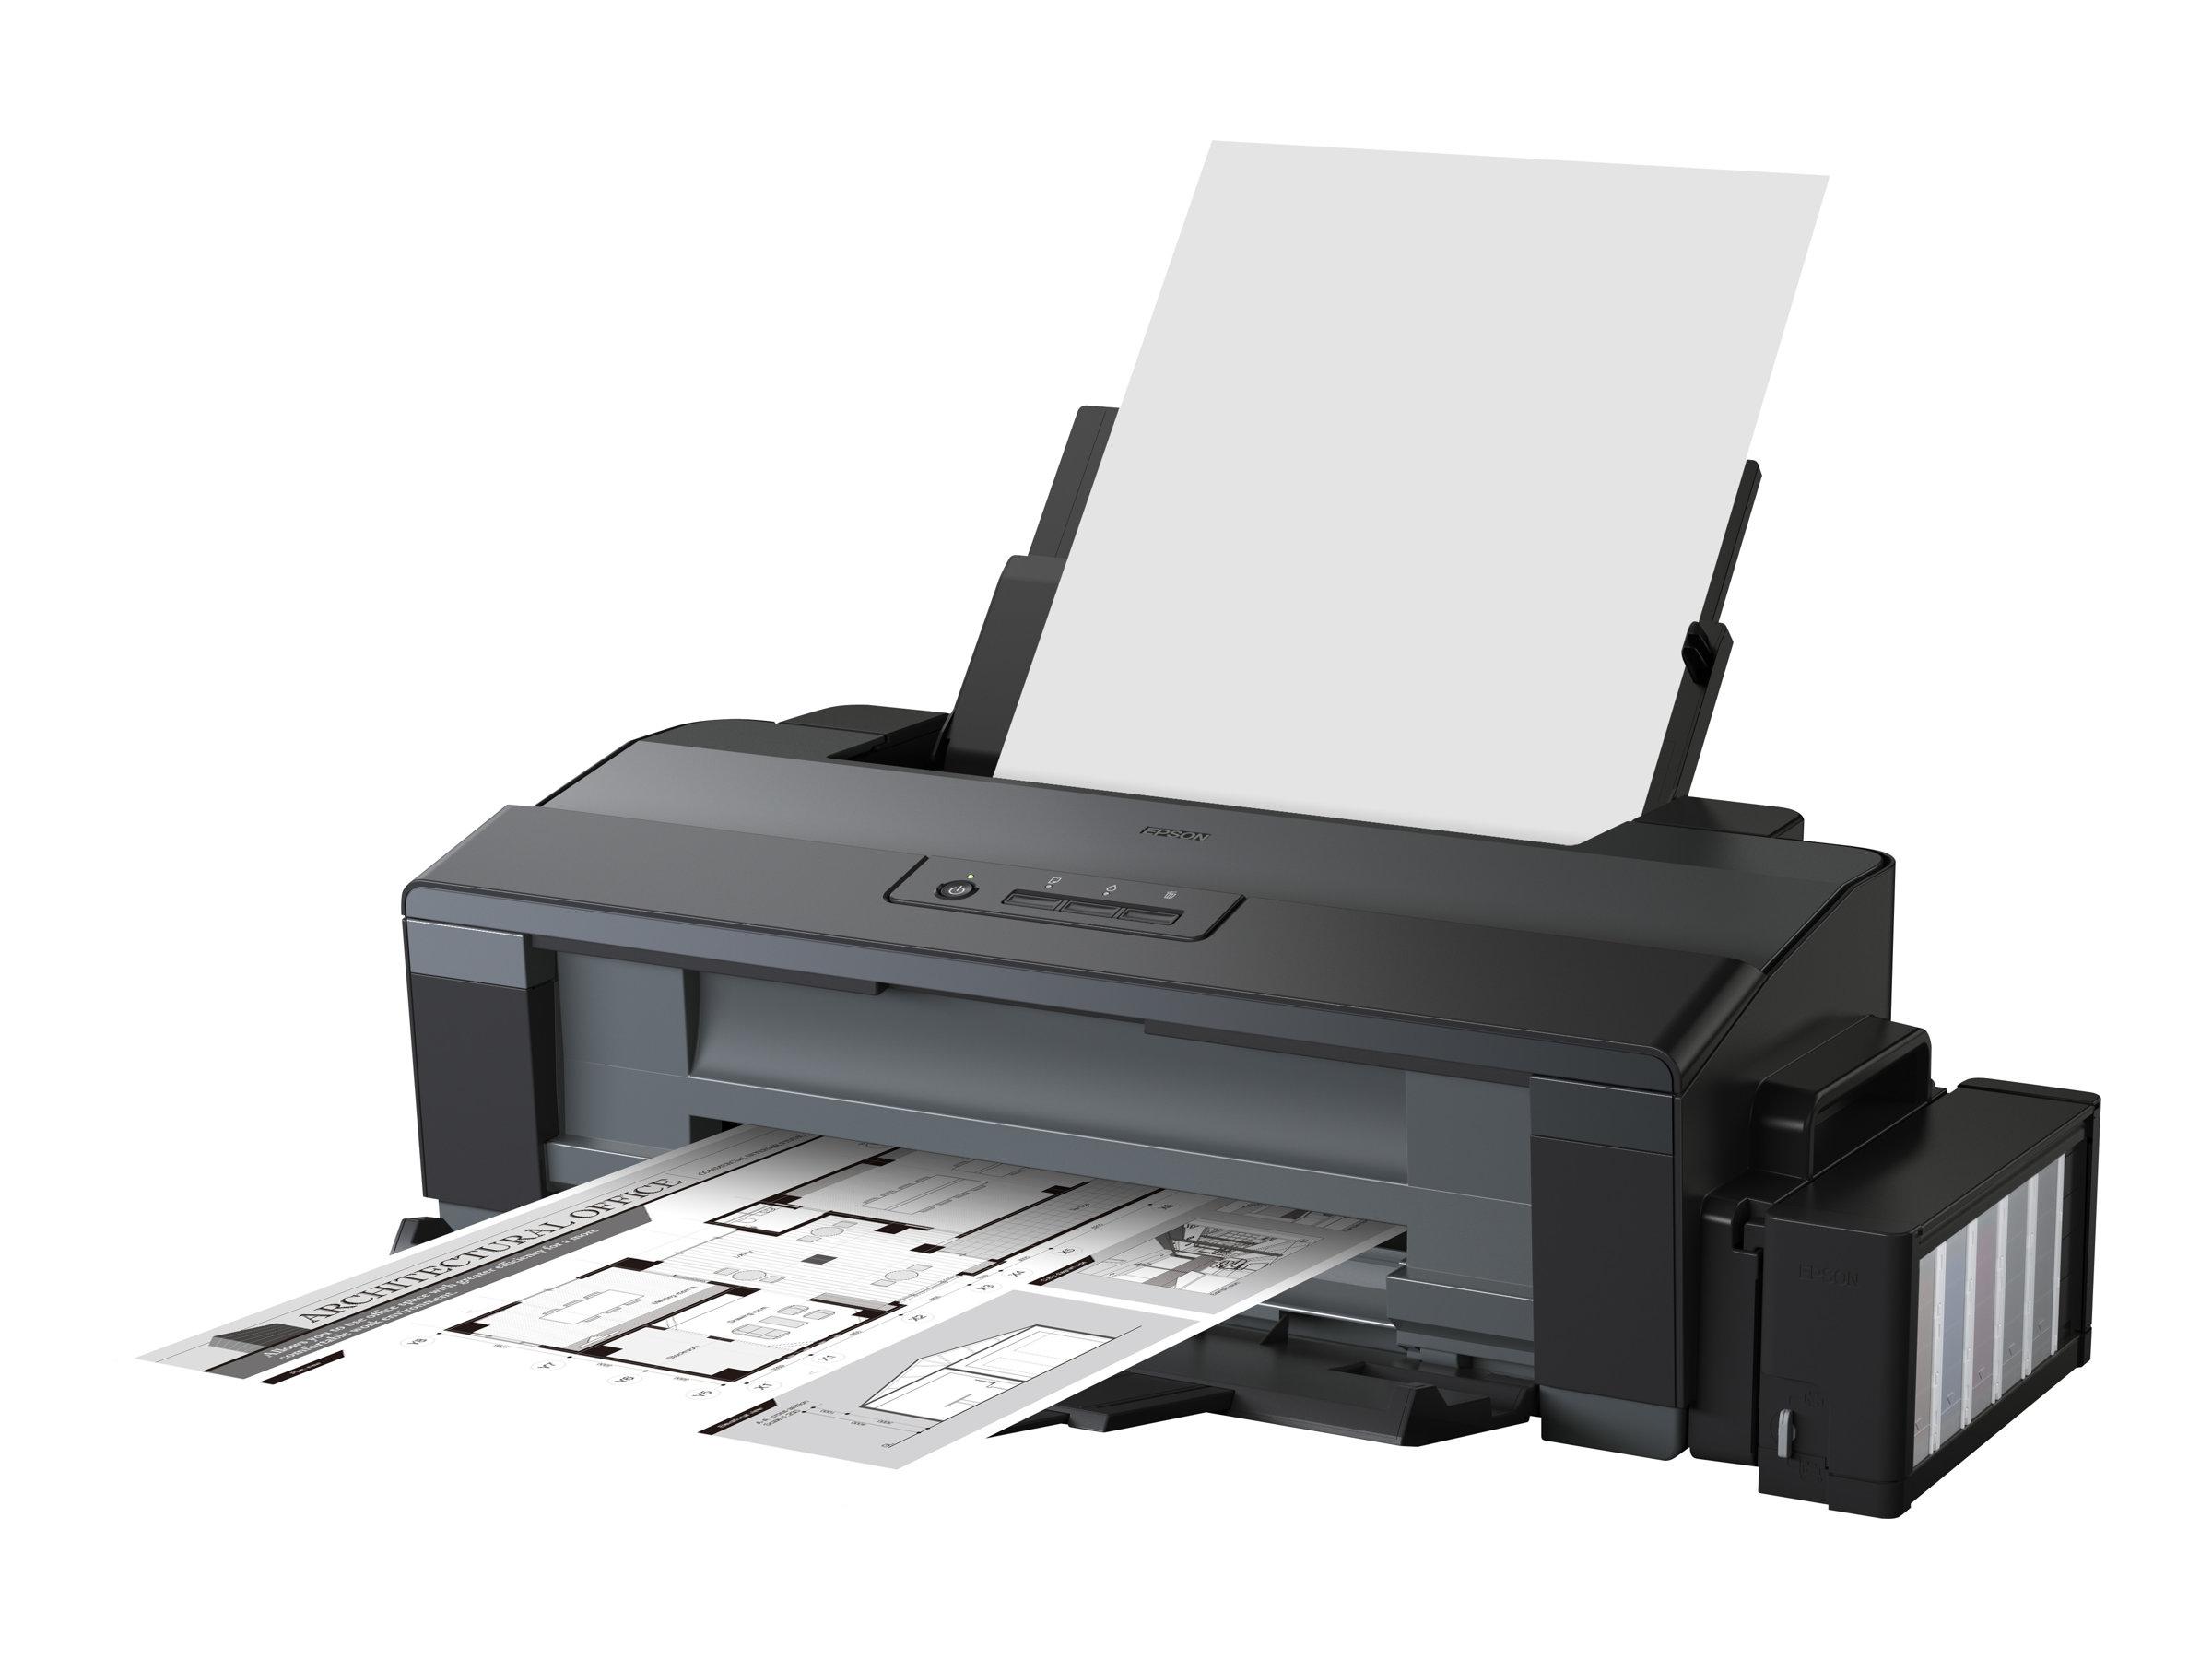 Epson EcoTank ET-14000 - Drucker - Farbe - Tintenstrahl - refillable - A3